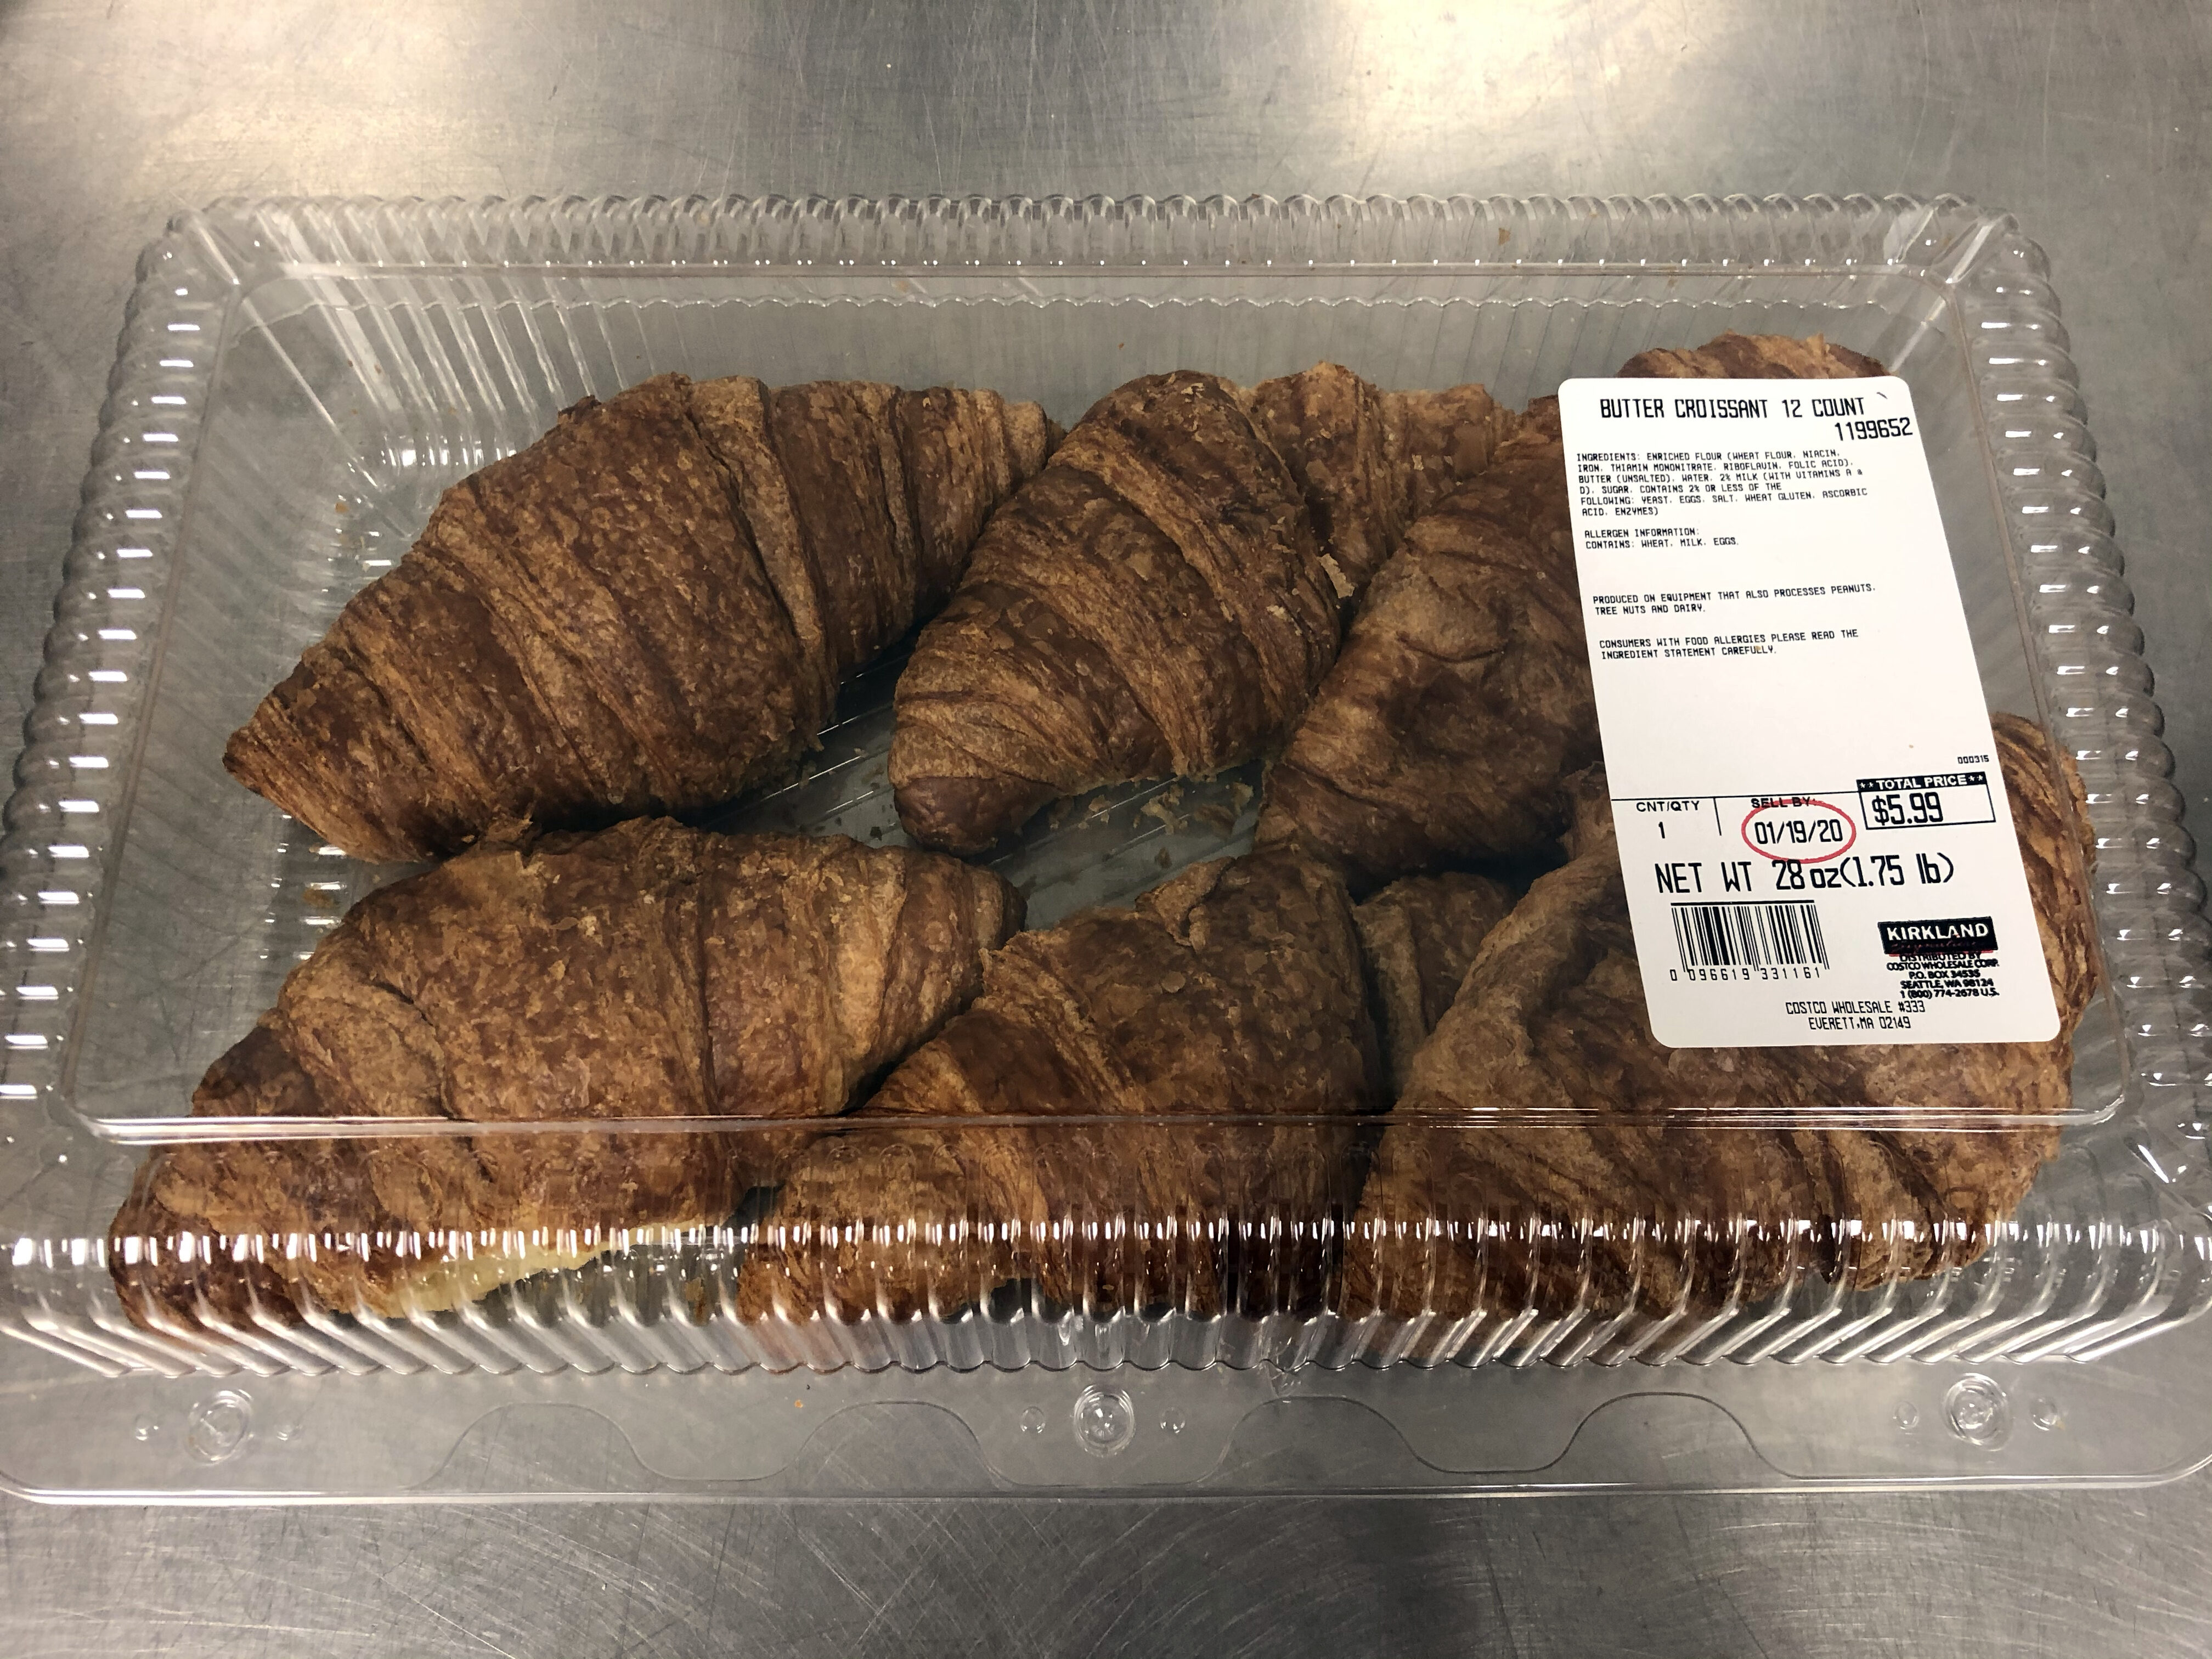 Butter Croissant - Product